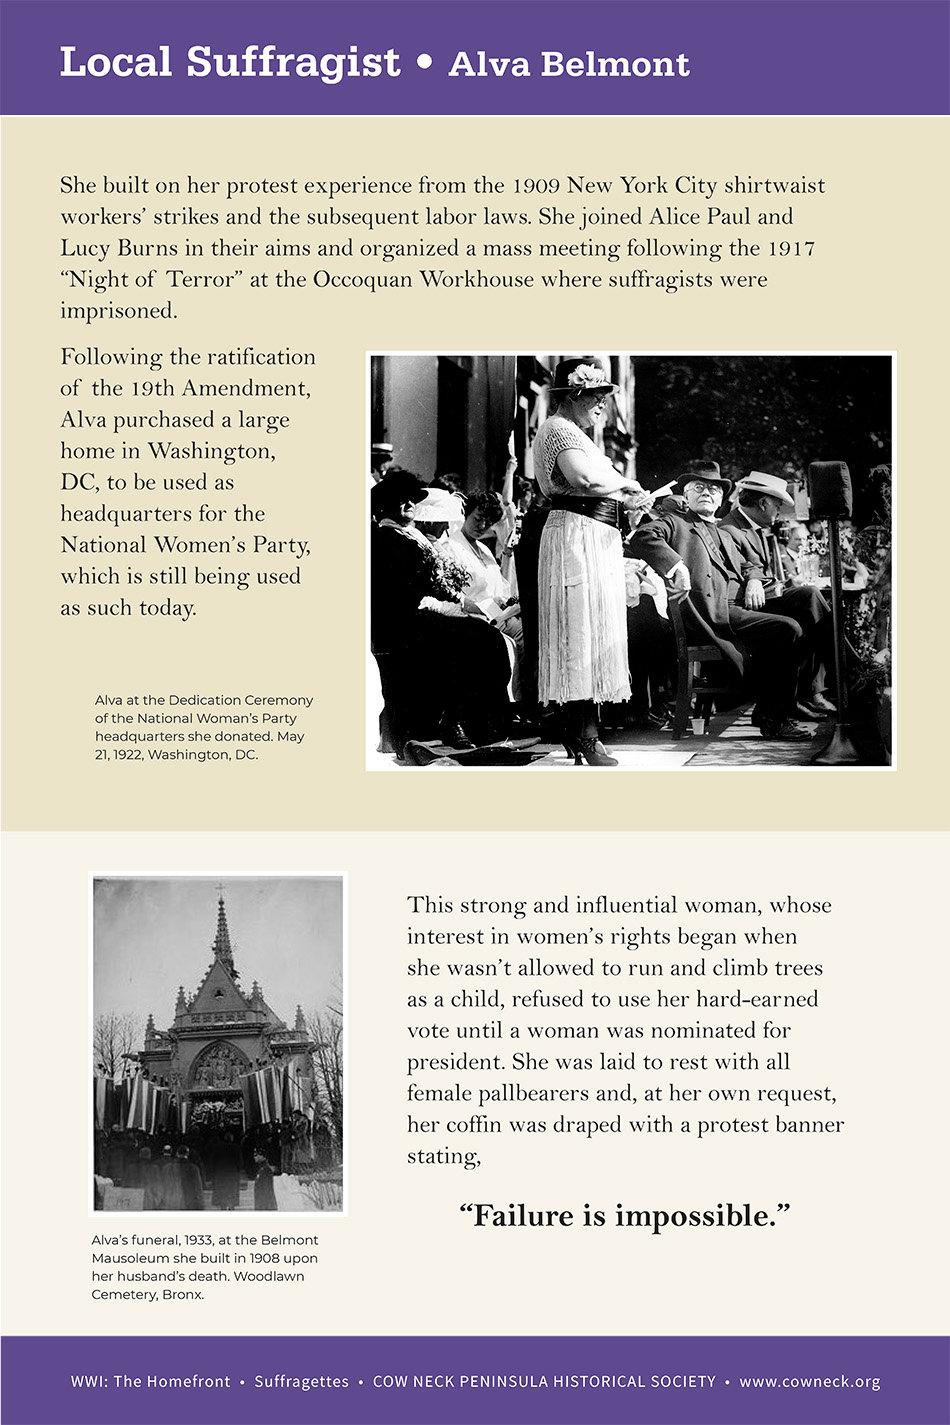 LI_Suffragettes_Alva Belmont_082020_rev-